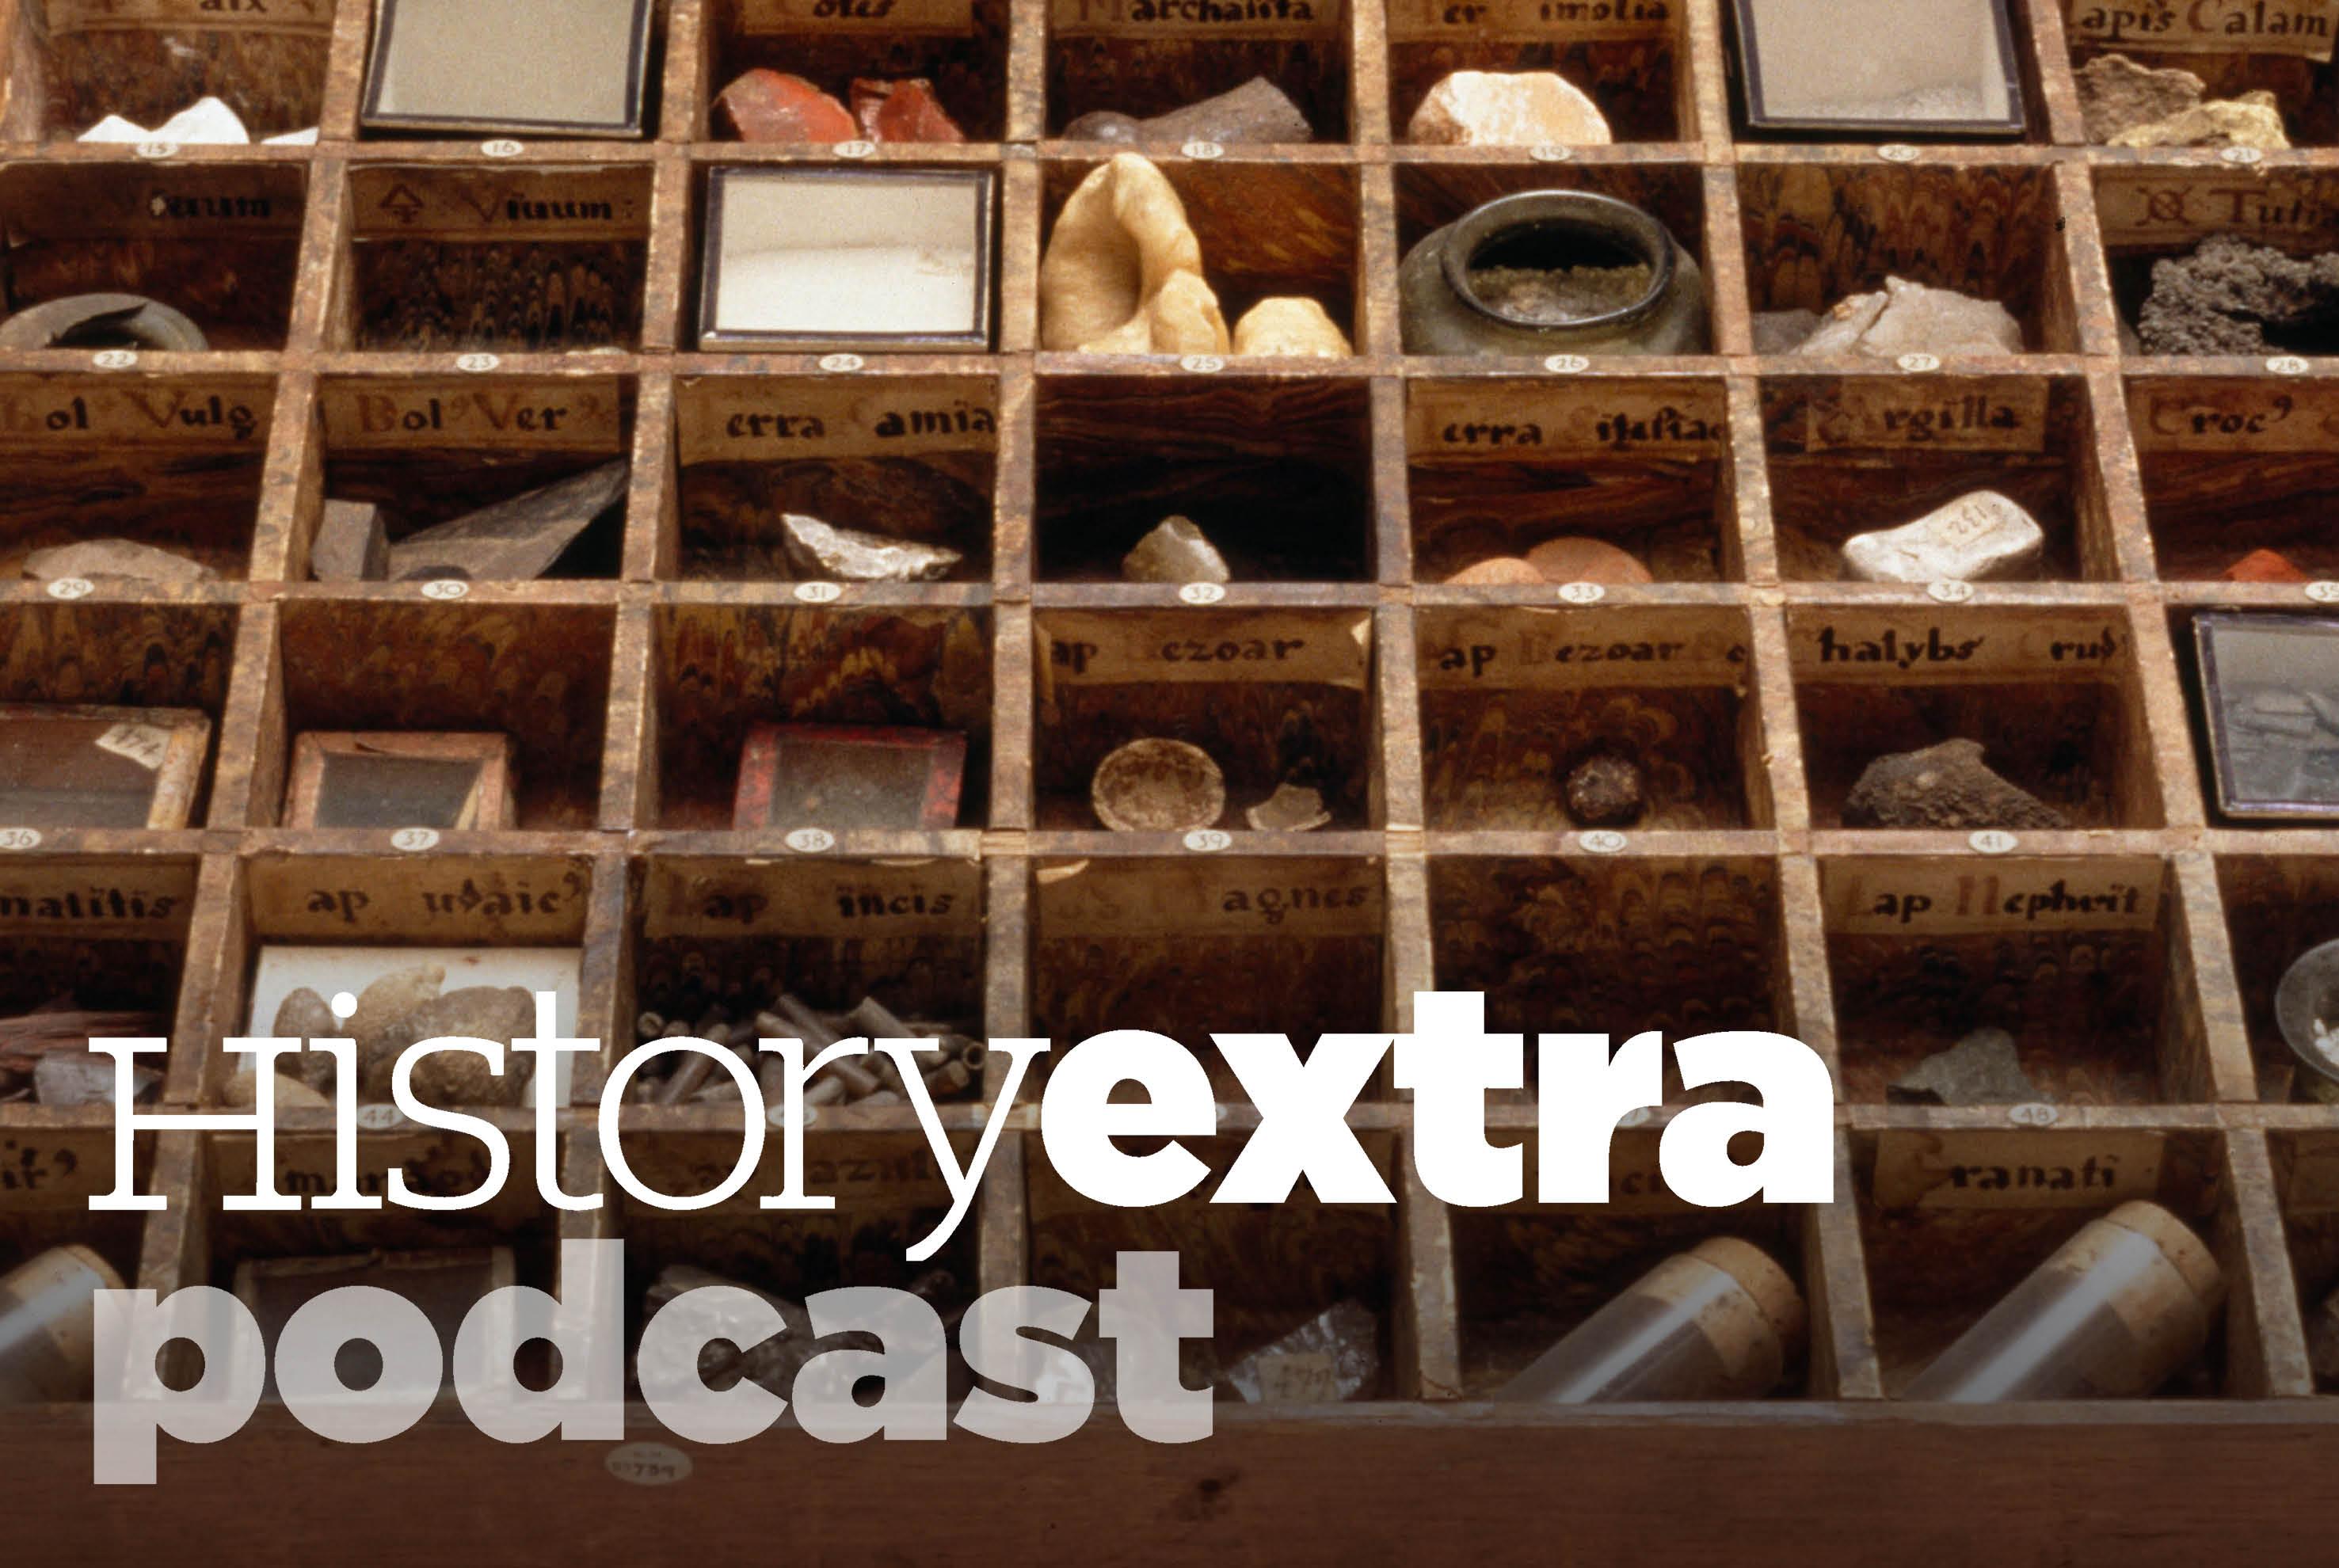 Podcast-Website-large-July-2017-James-Delbourgo-86f9b49